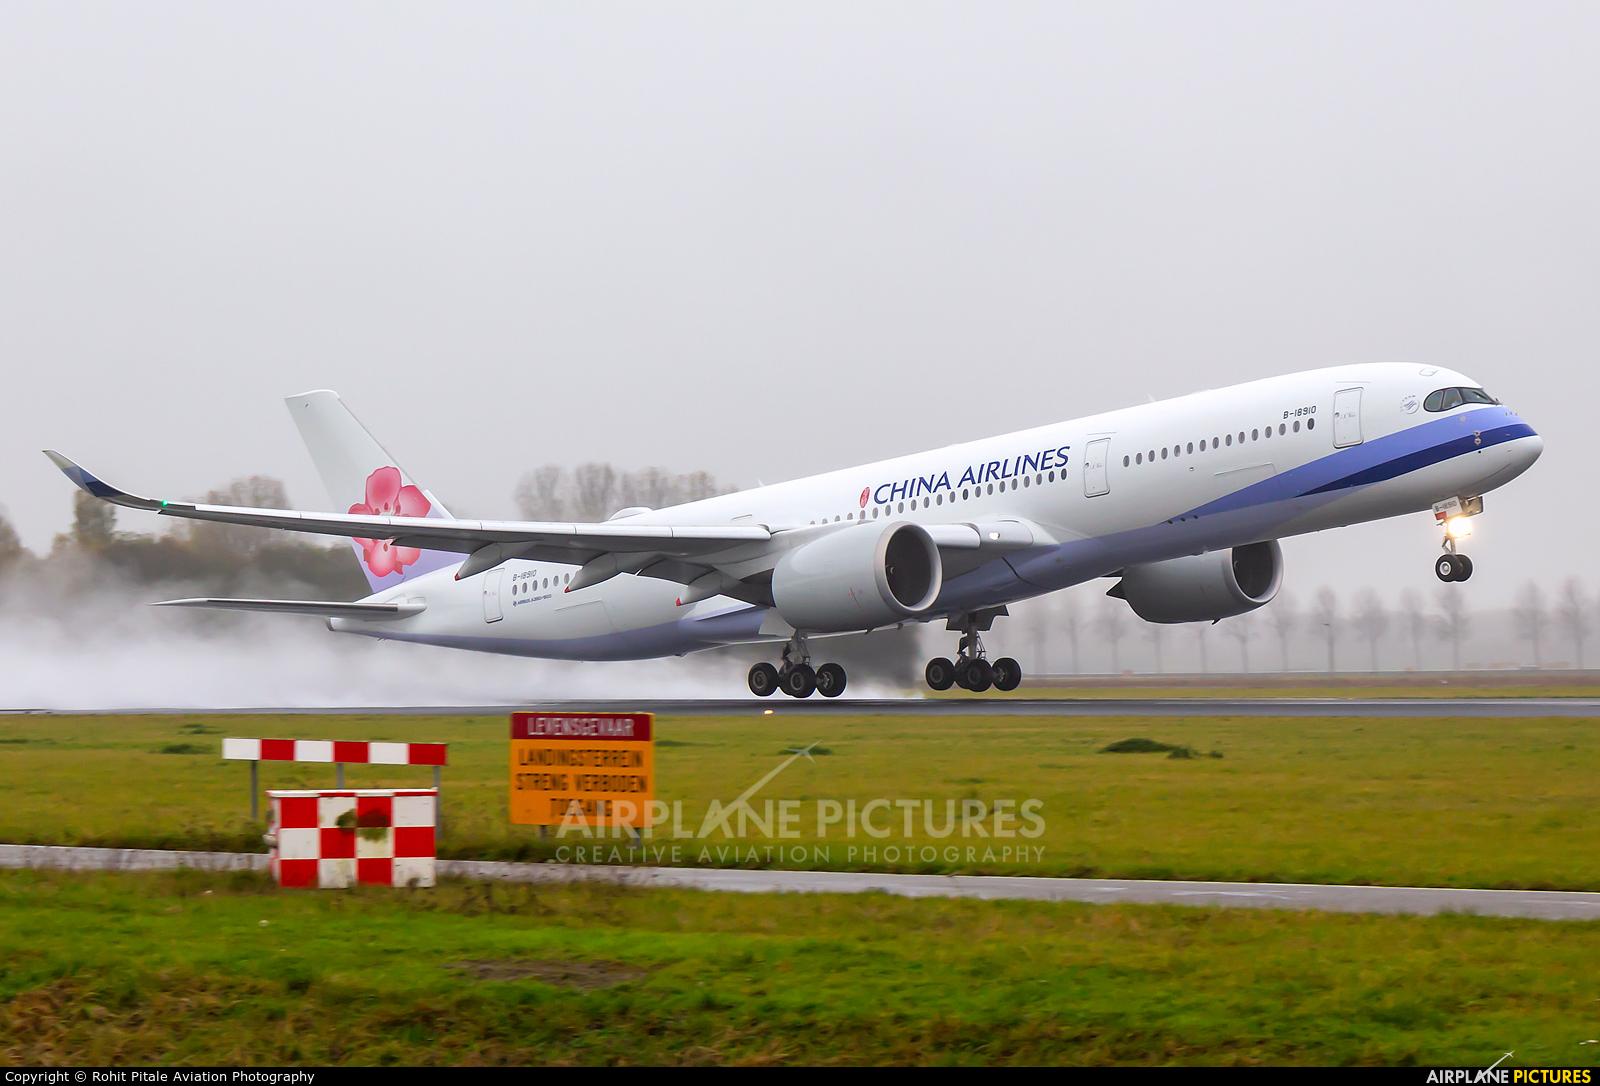 China Airlines B-18910 aircraft at Amsterdam - Schiphol